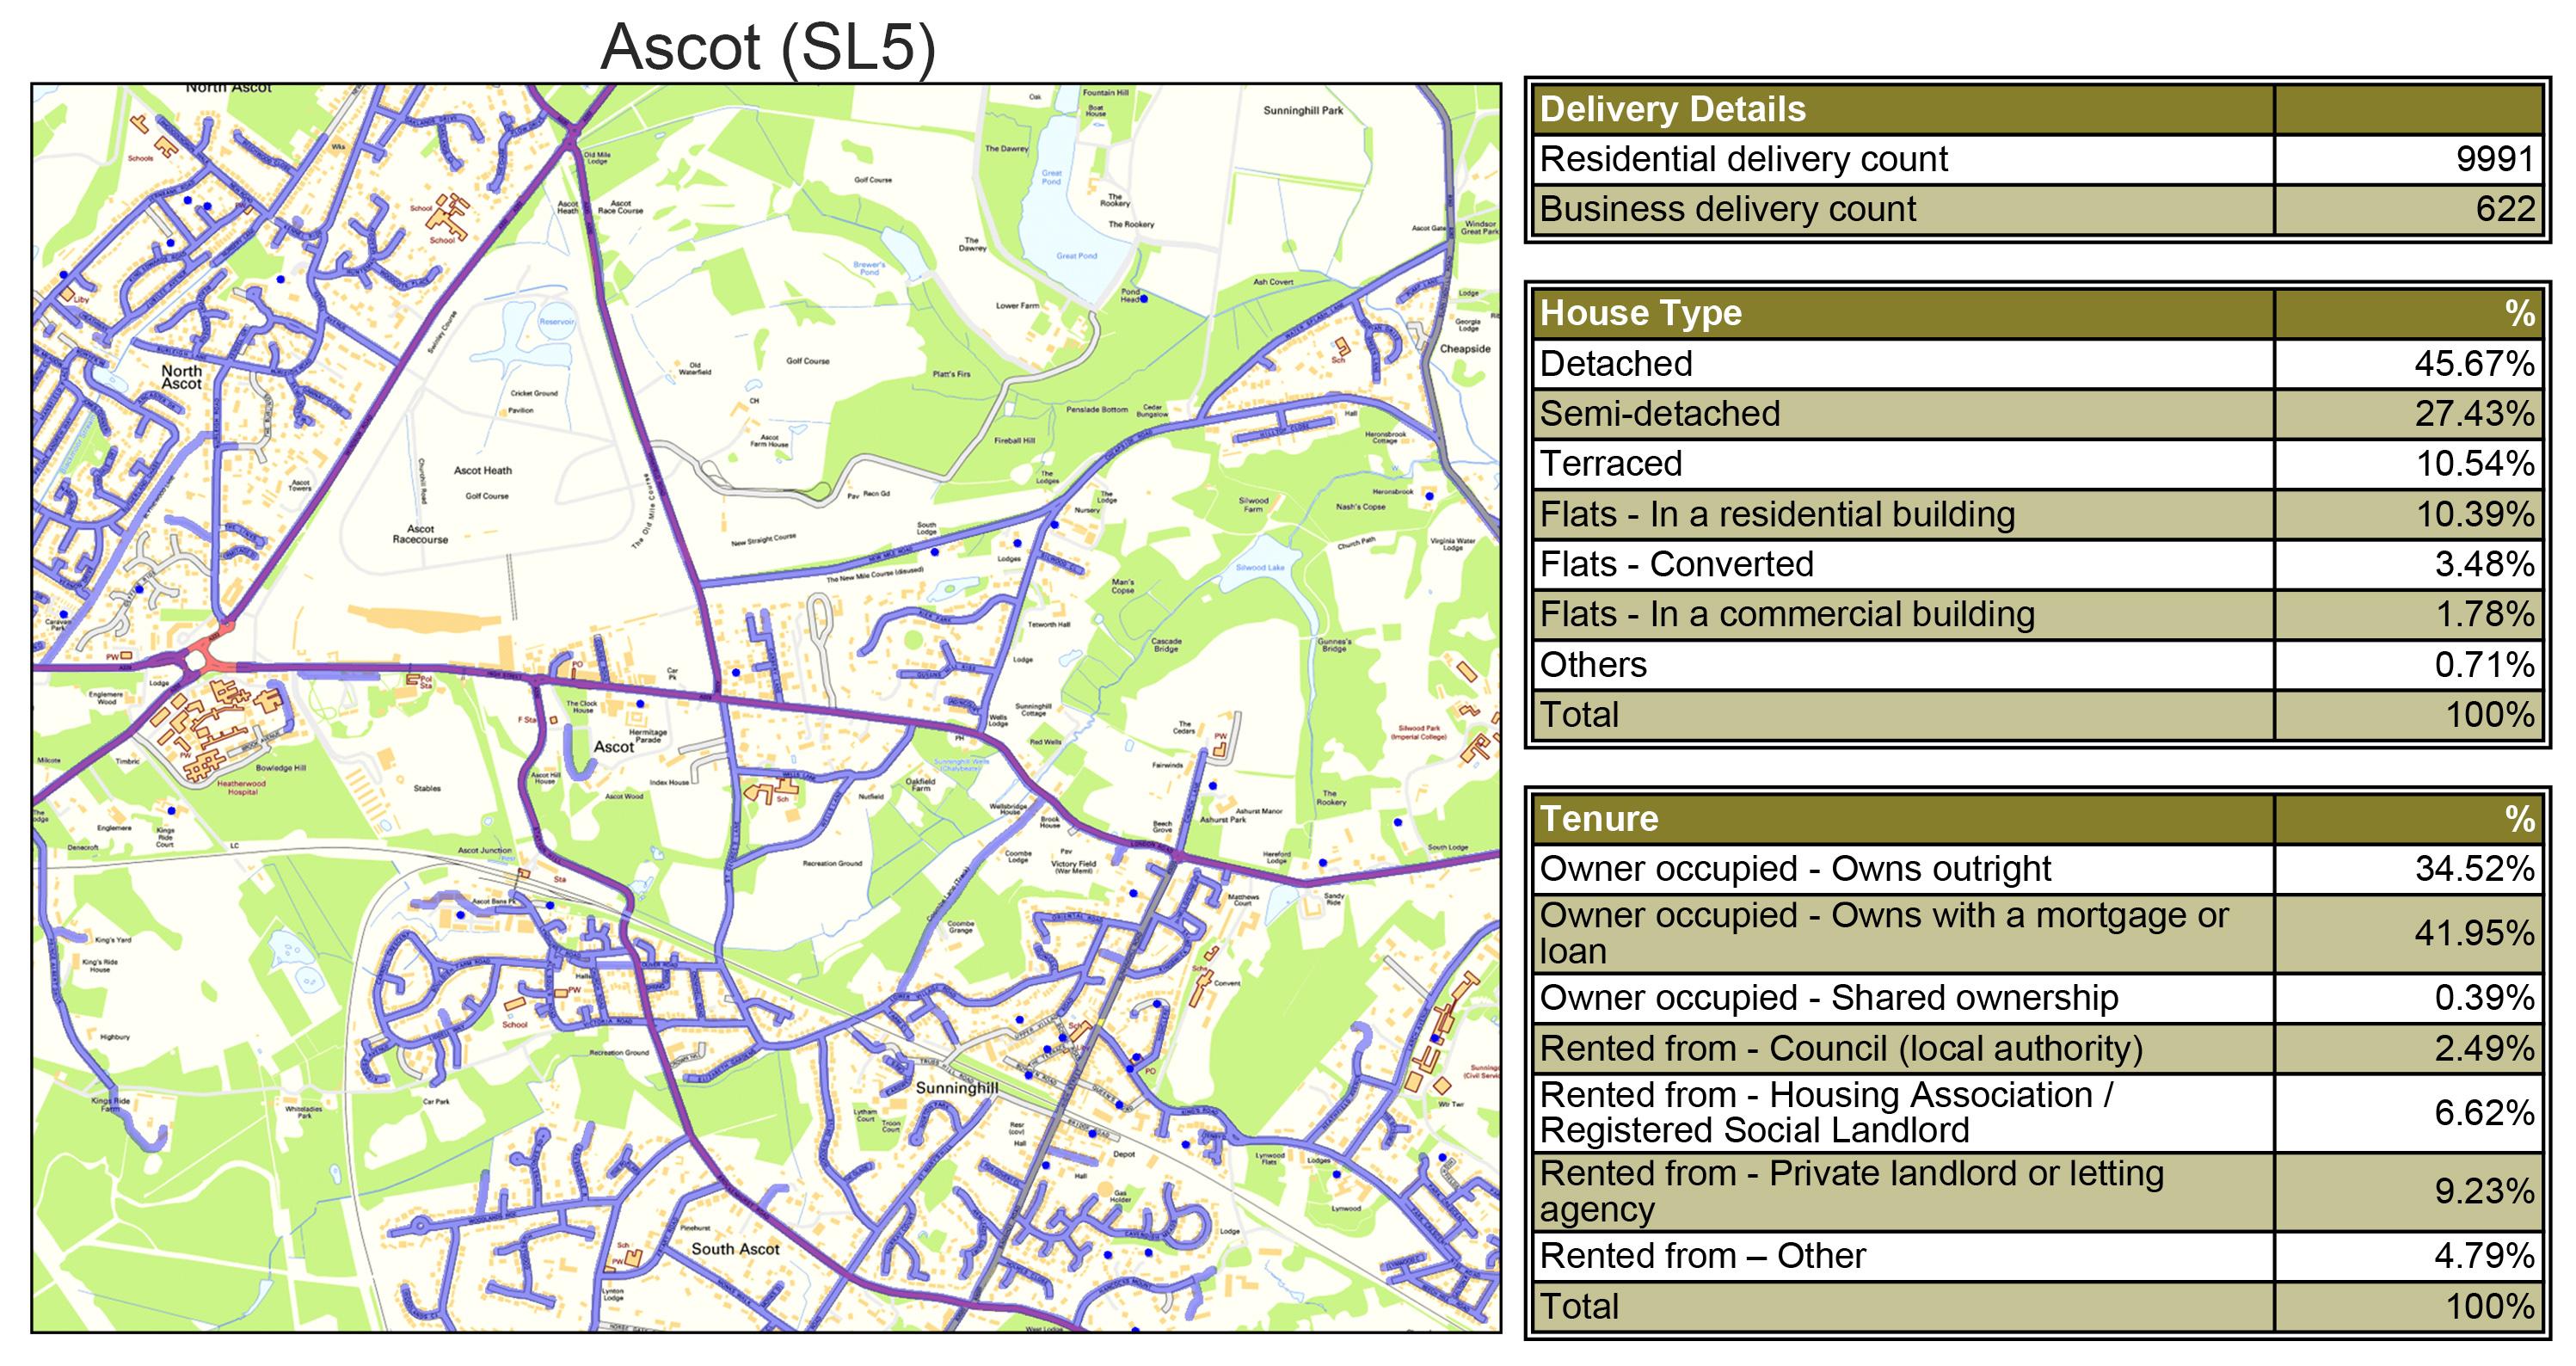 Leaflet Distribution Ascot - Geoplan Image